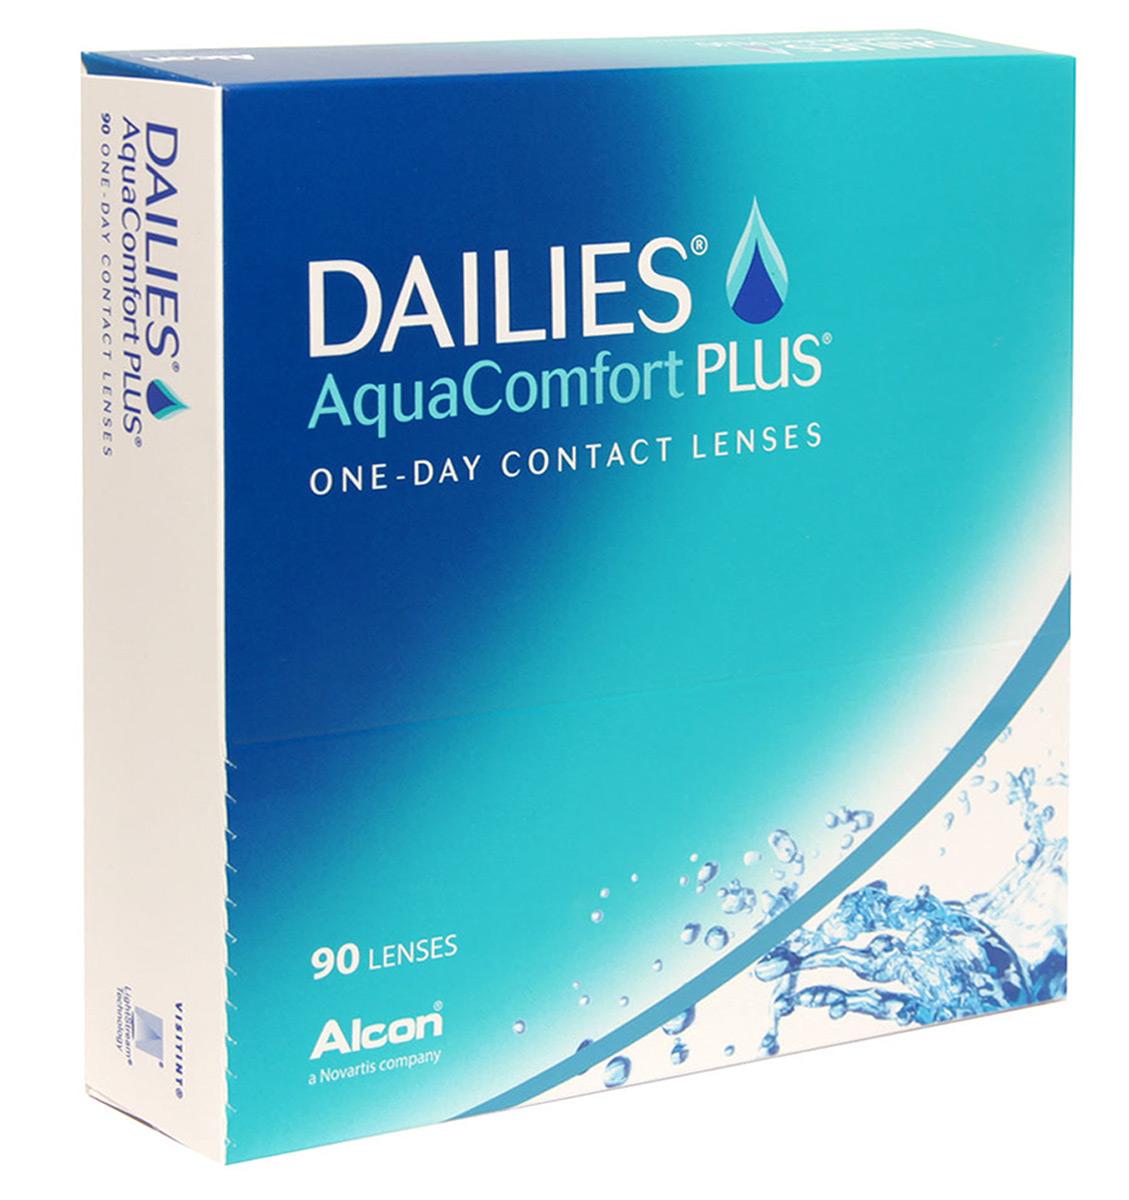 Alcon-CIBA Vision контактные линзы Dailies AquaComfort Plus (90шт / 8.7 / 14.0 / +3.00)